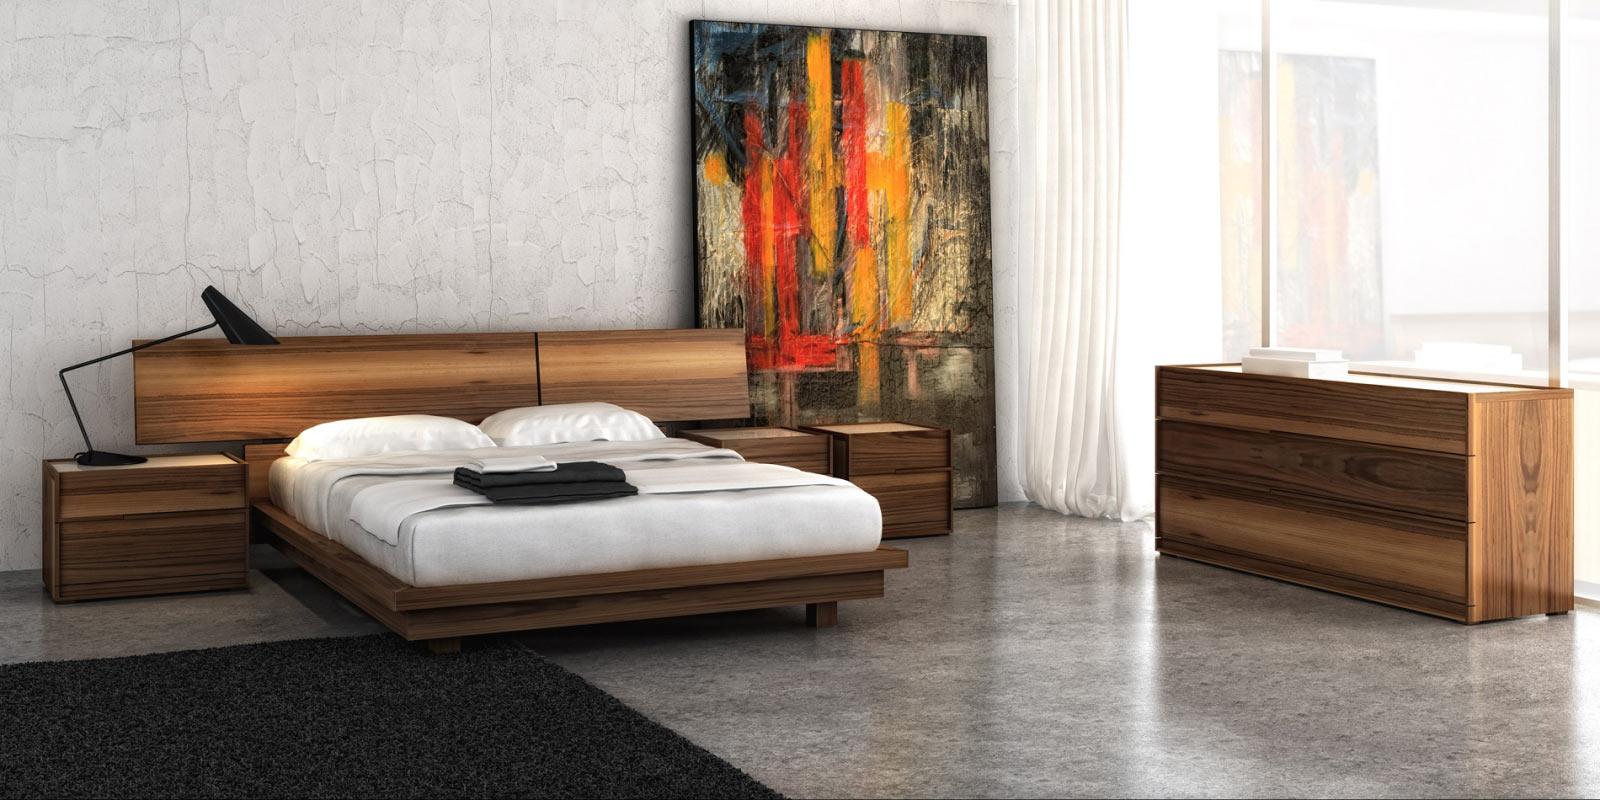 UP Sleeping SWAN Collection Furniture Manufacturer